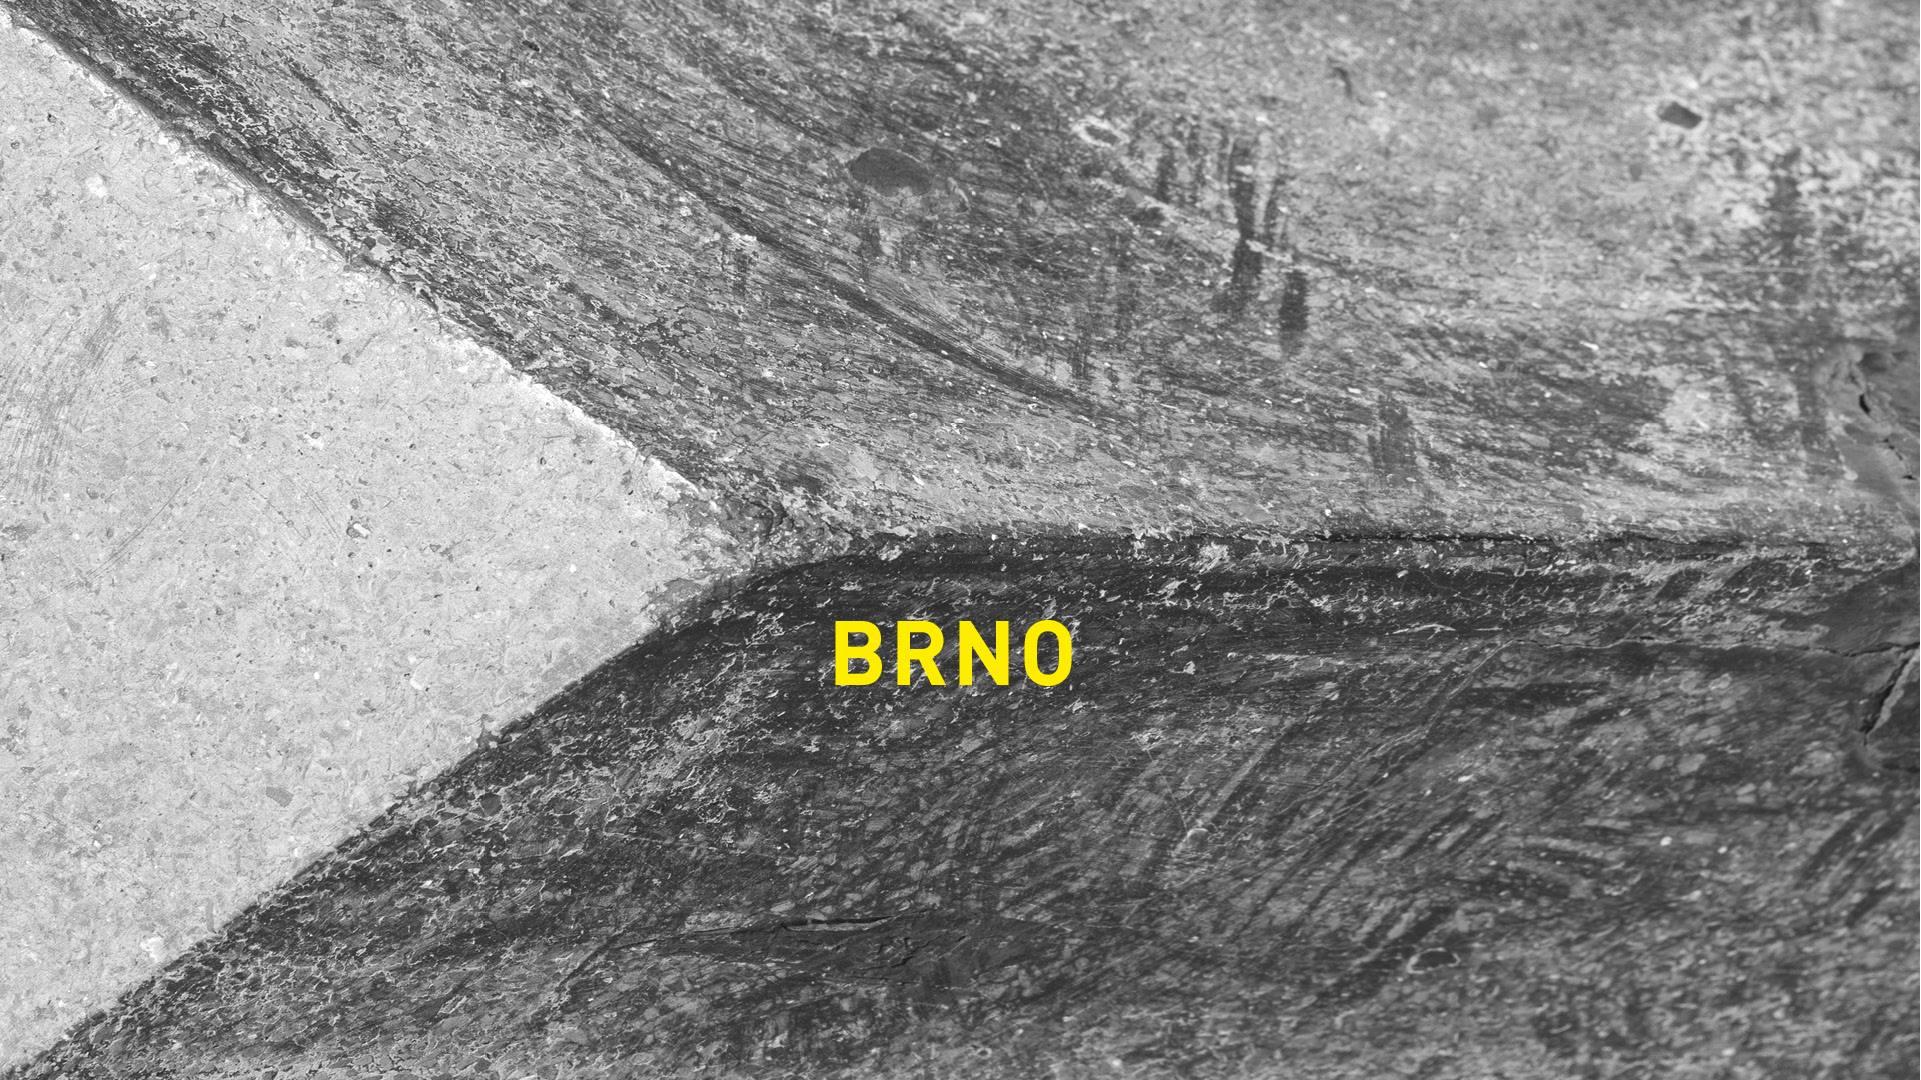 NE / 30.9. / 10:00 / Den architektury: Kolama novýma Brnama / cyklovyjížďka